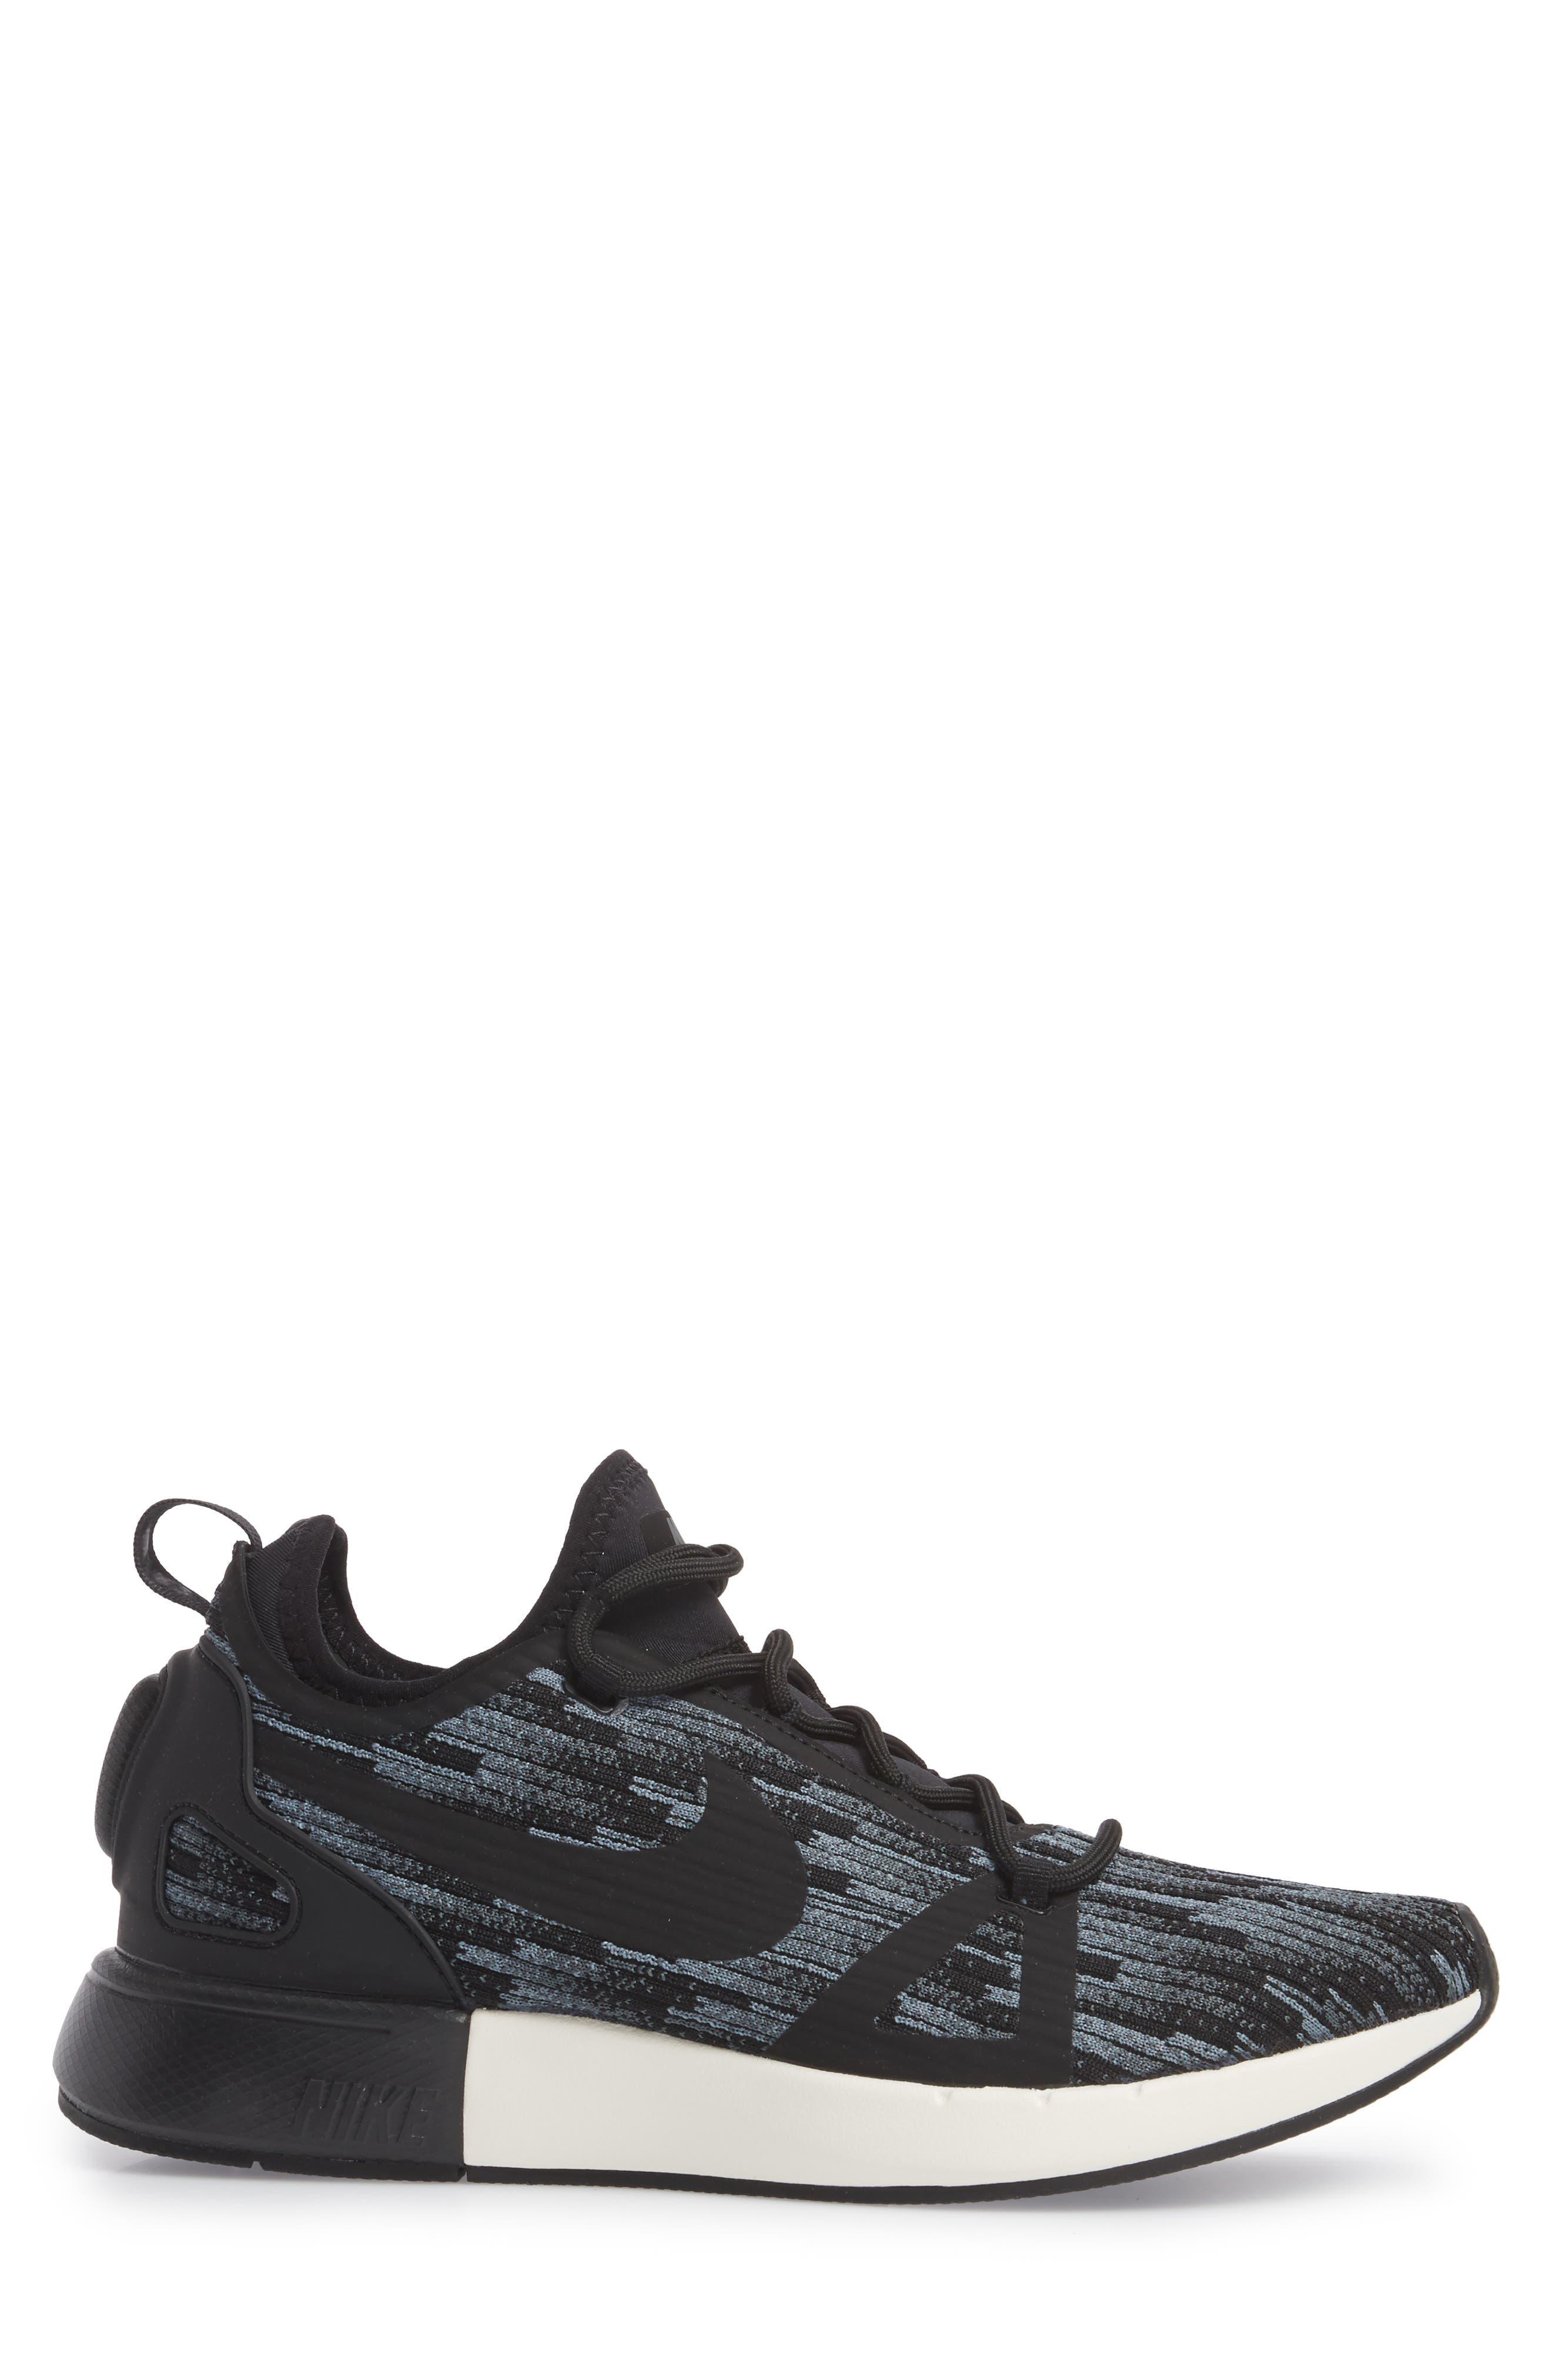 Alternate Image 3  - Nike Duel Racer SE Knit Sneaker (Women)